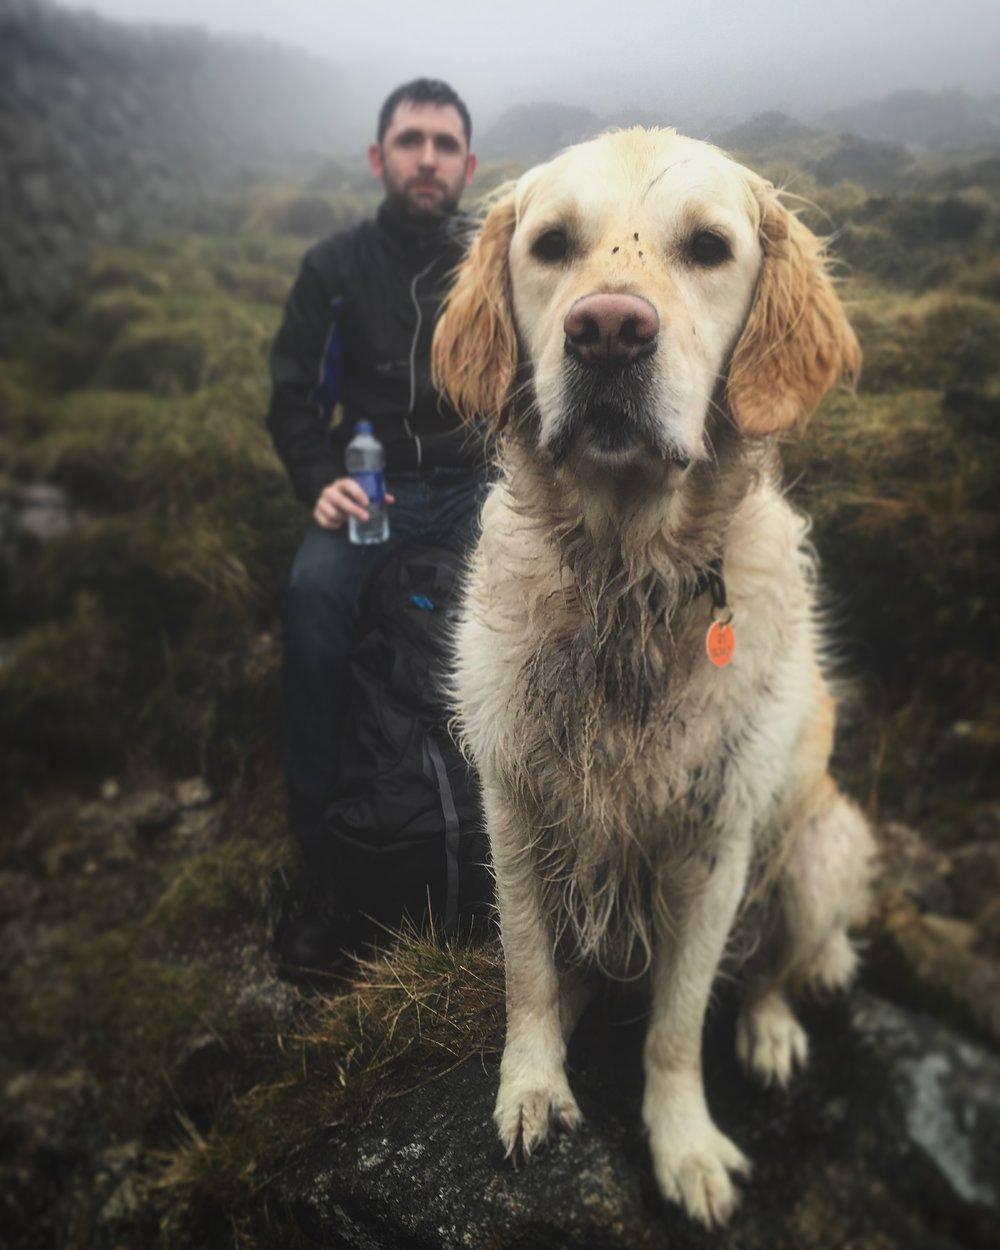 dog_pup_golden_retriever_hares_gap_slieve_donard_newcastle_tollymore_mourne_mountains_ni_explorer_niexplorer_northern_ireland_blog.jpg